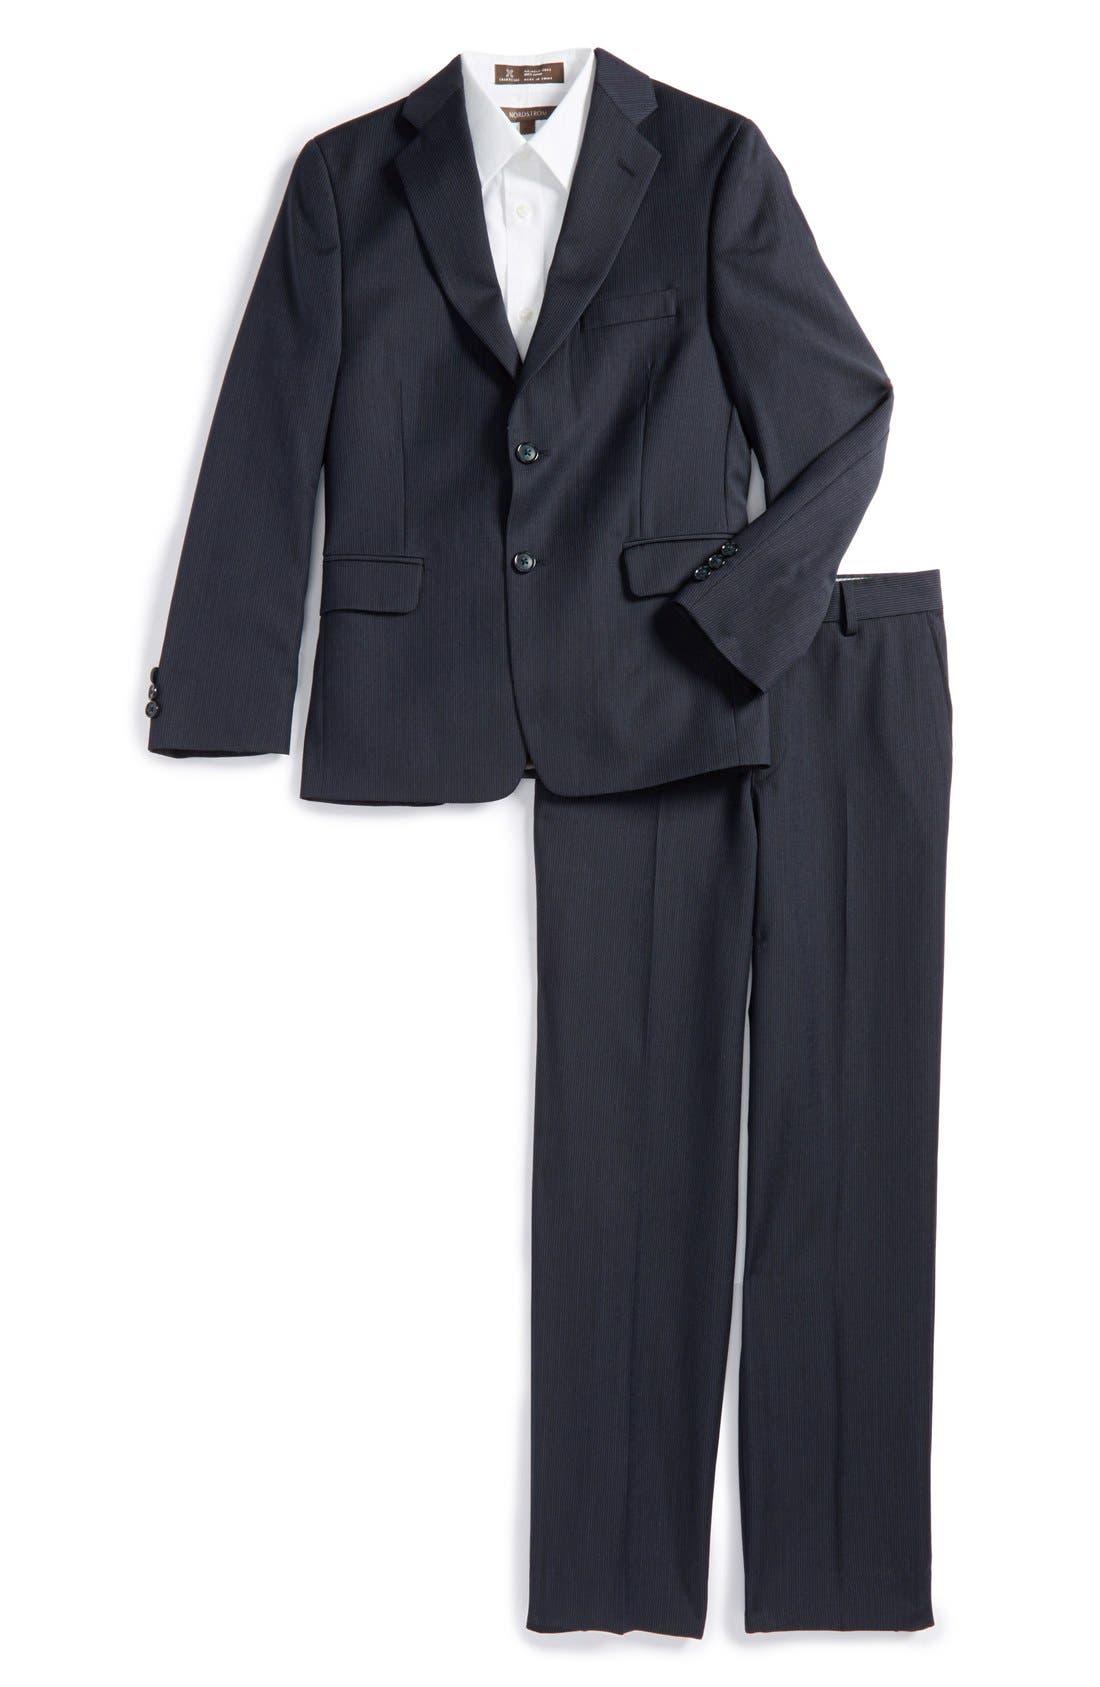 Alternate Image 1 Selected - Nordstrom 'Nathaniel' Stripe Suit (Big Boys)